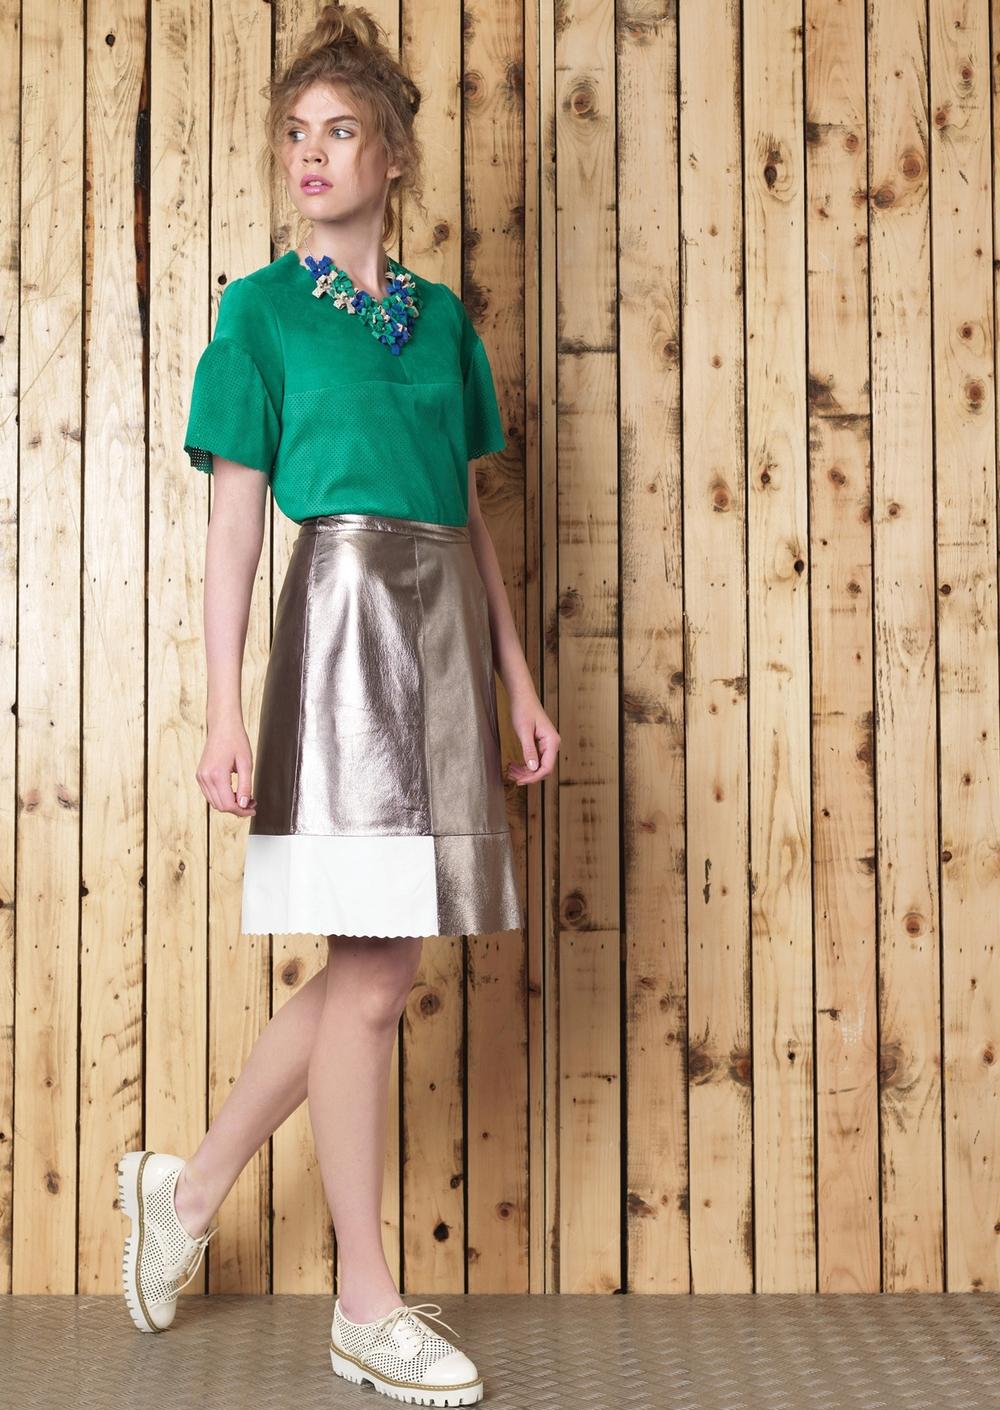 Manley Cori Necklace // Erin Tee // Boxter Skirt